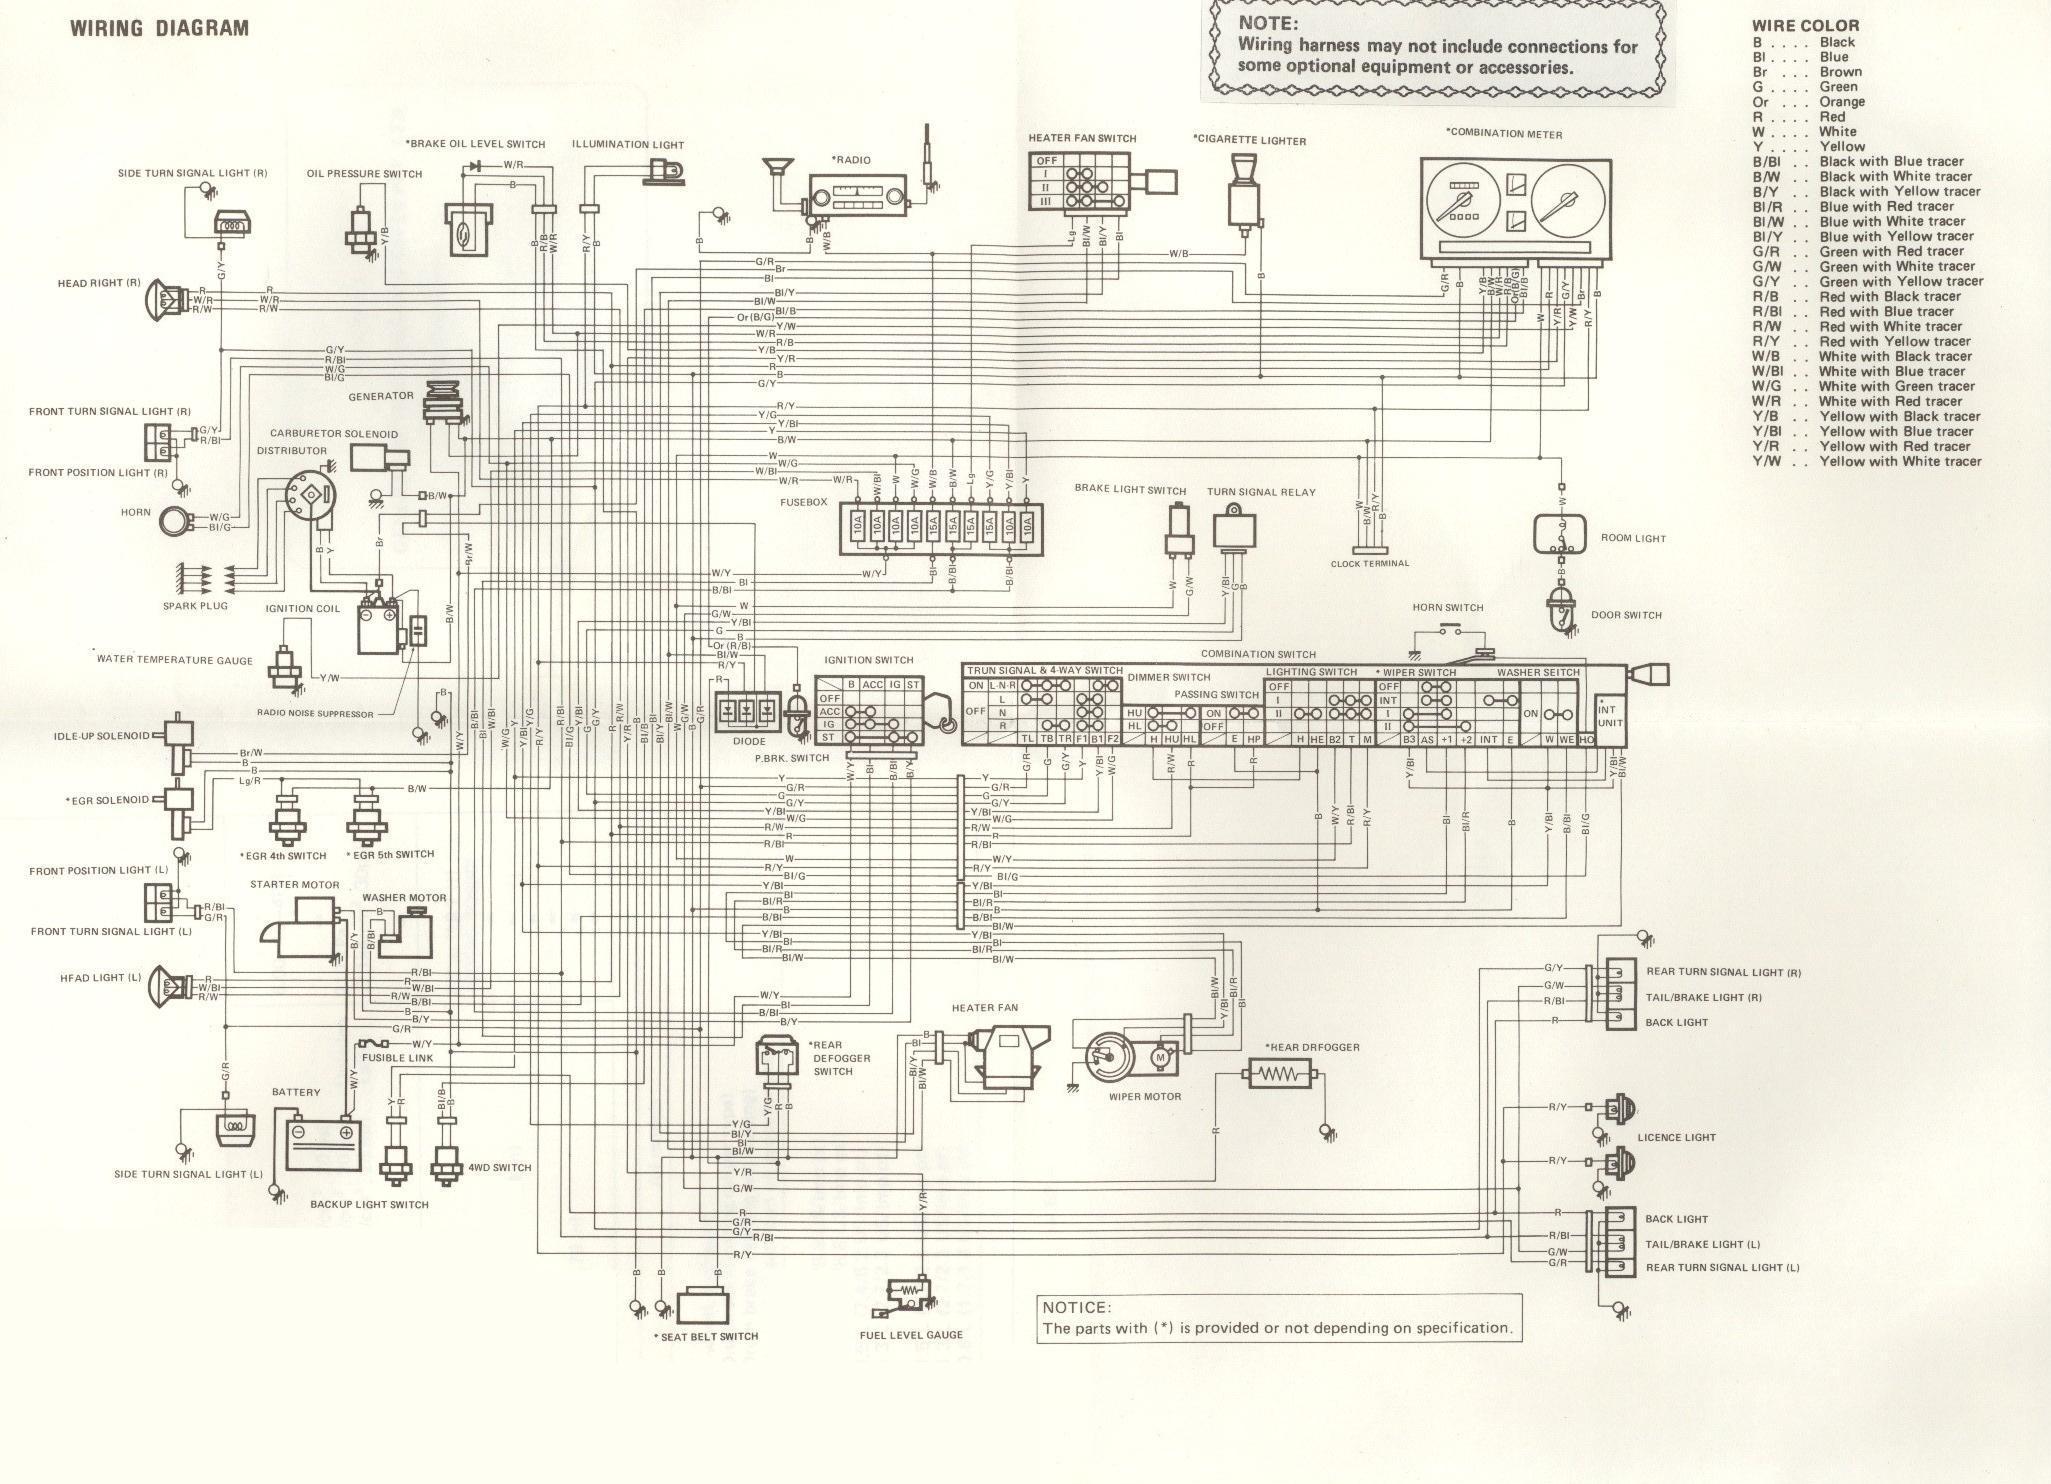 1986 Suzuki Samurai Wiring Diagram Leviton Switch Wiring Diagram For Single Bege Wiring Diagram